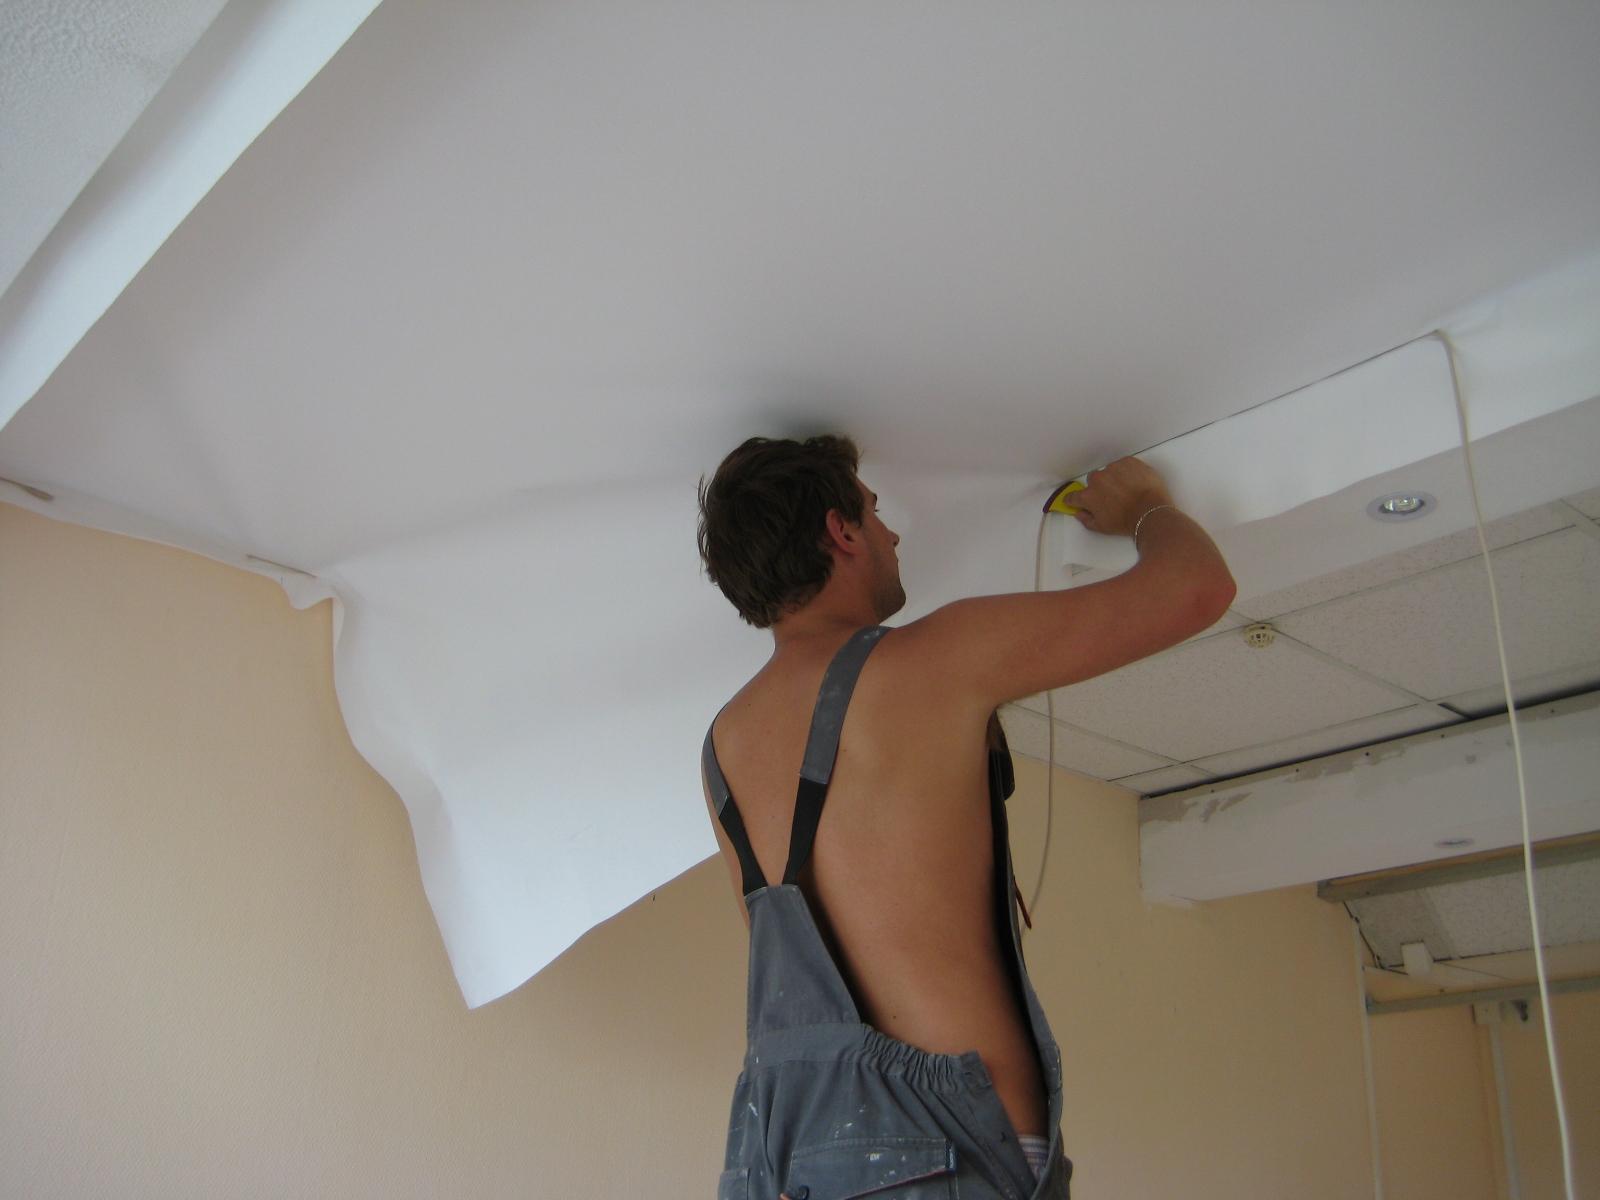 Особенности ремонта потолка в квартире